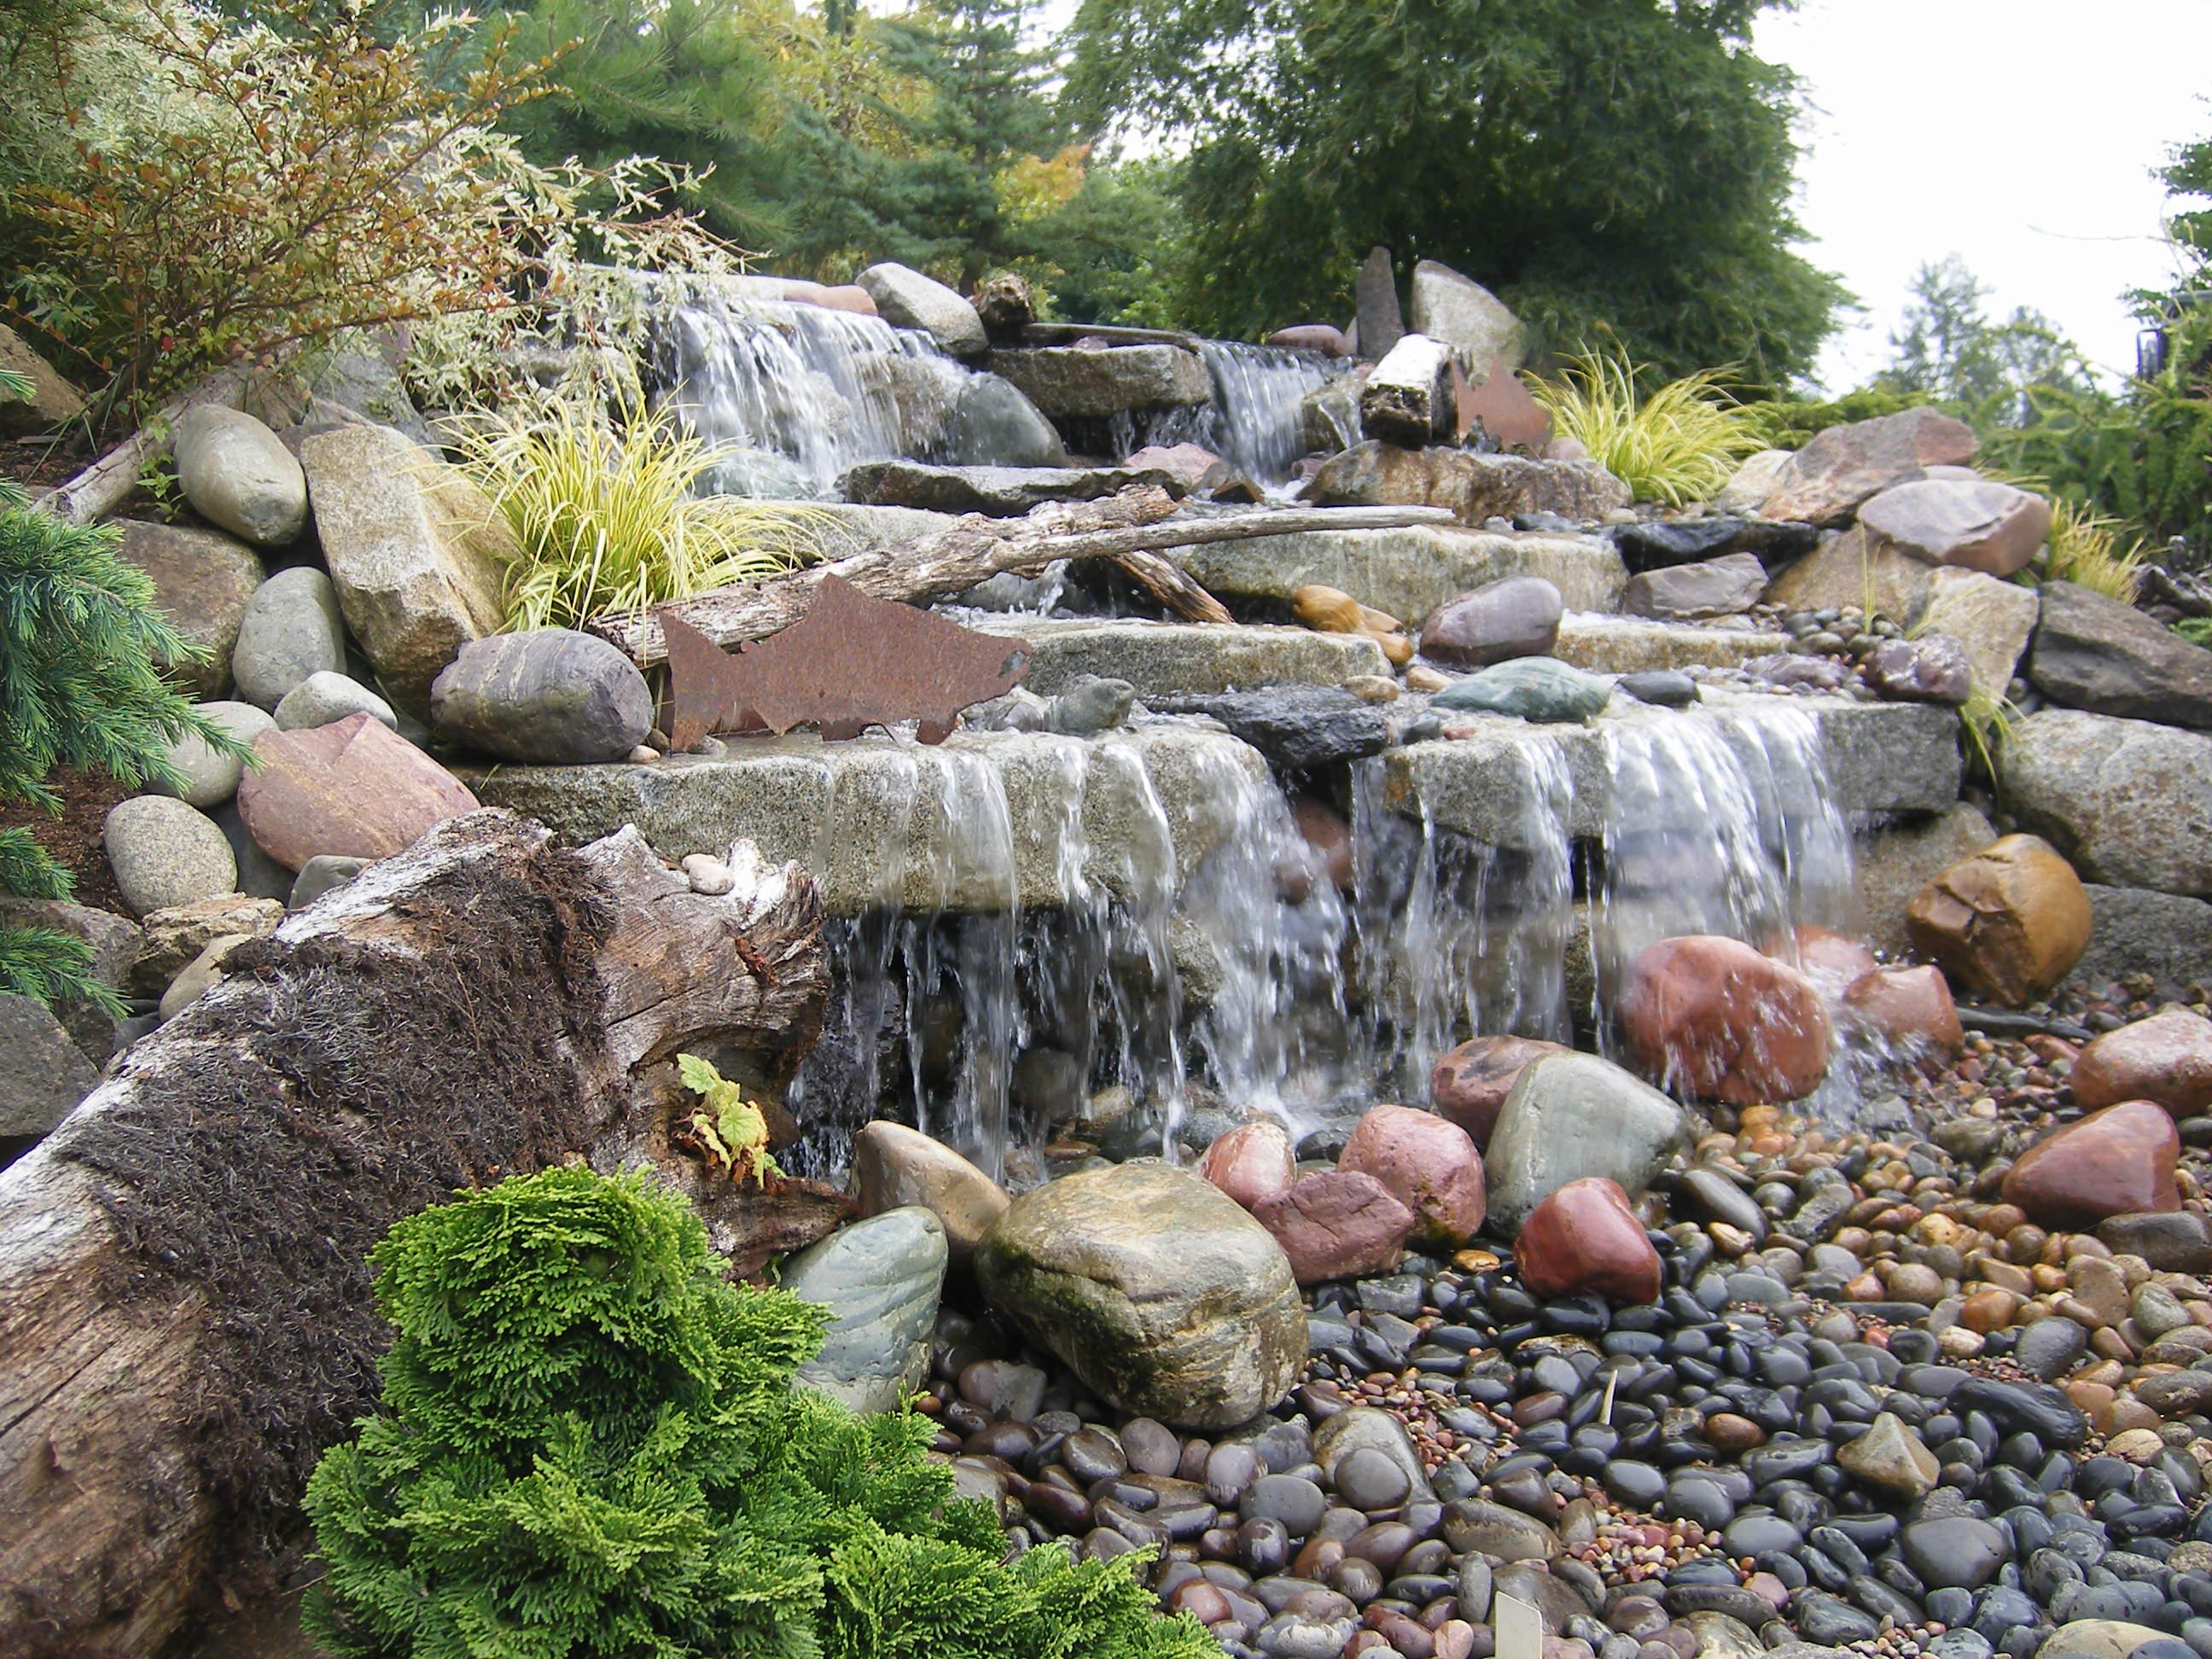 Ponds & Features